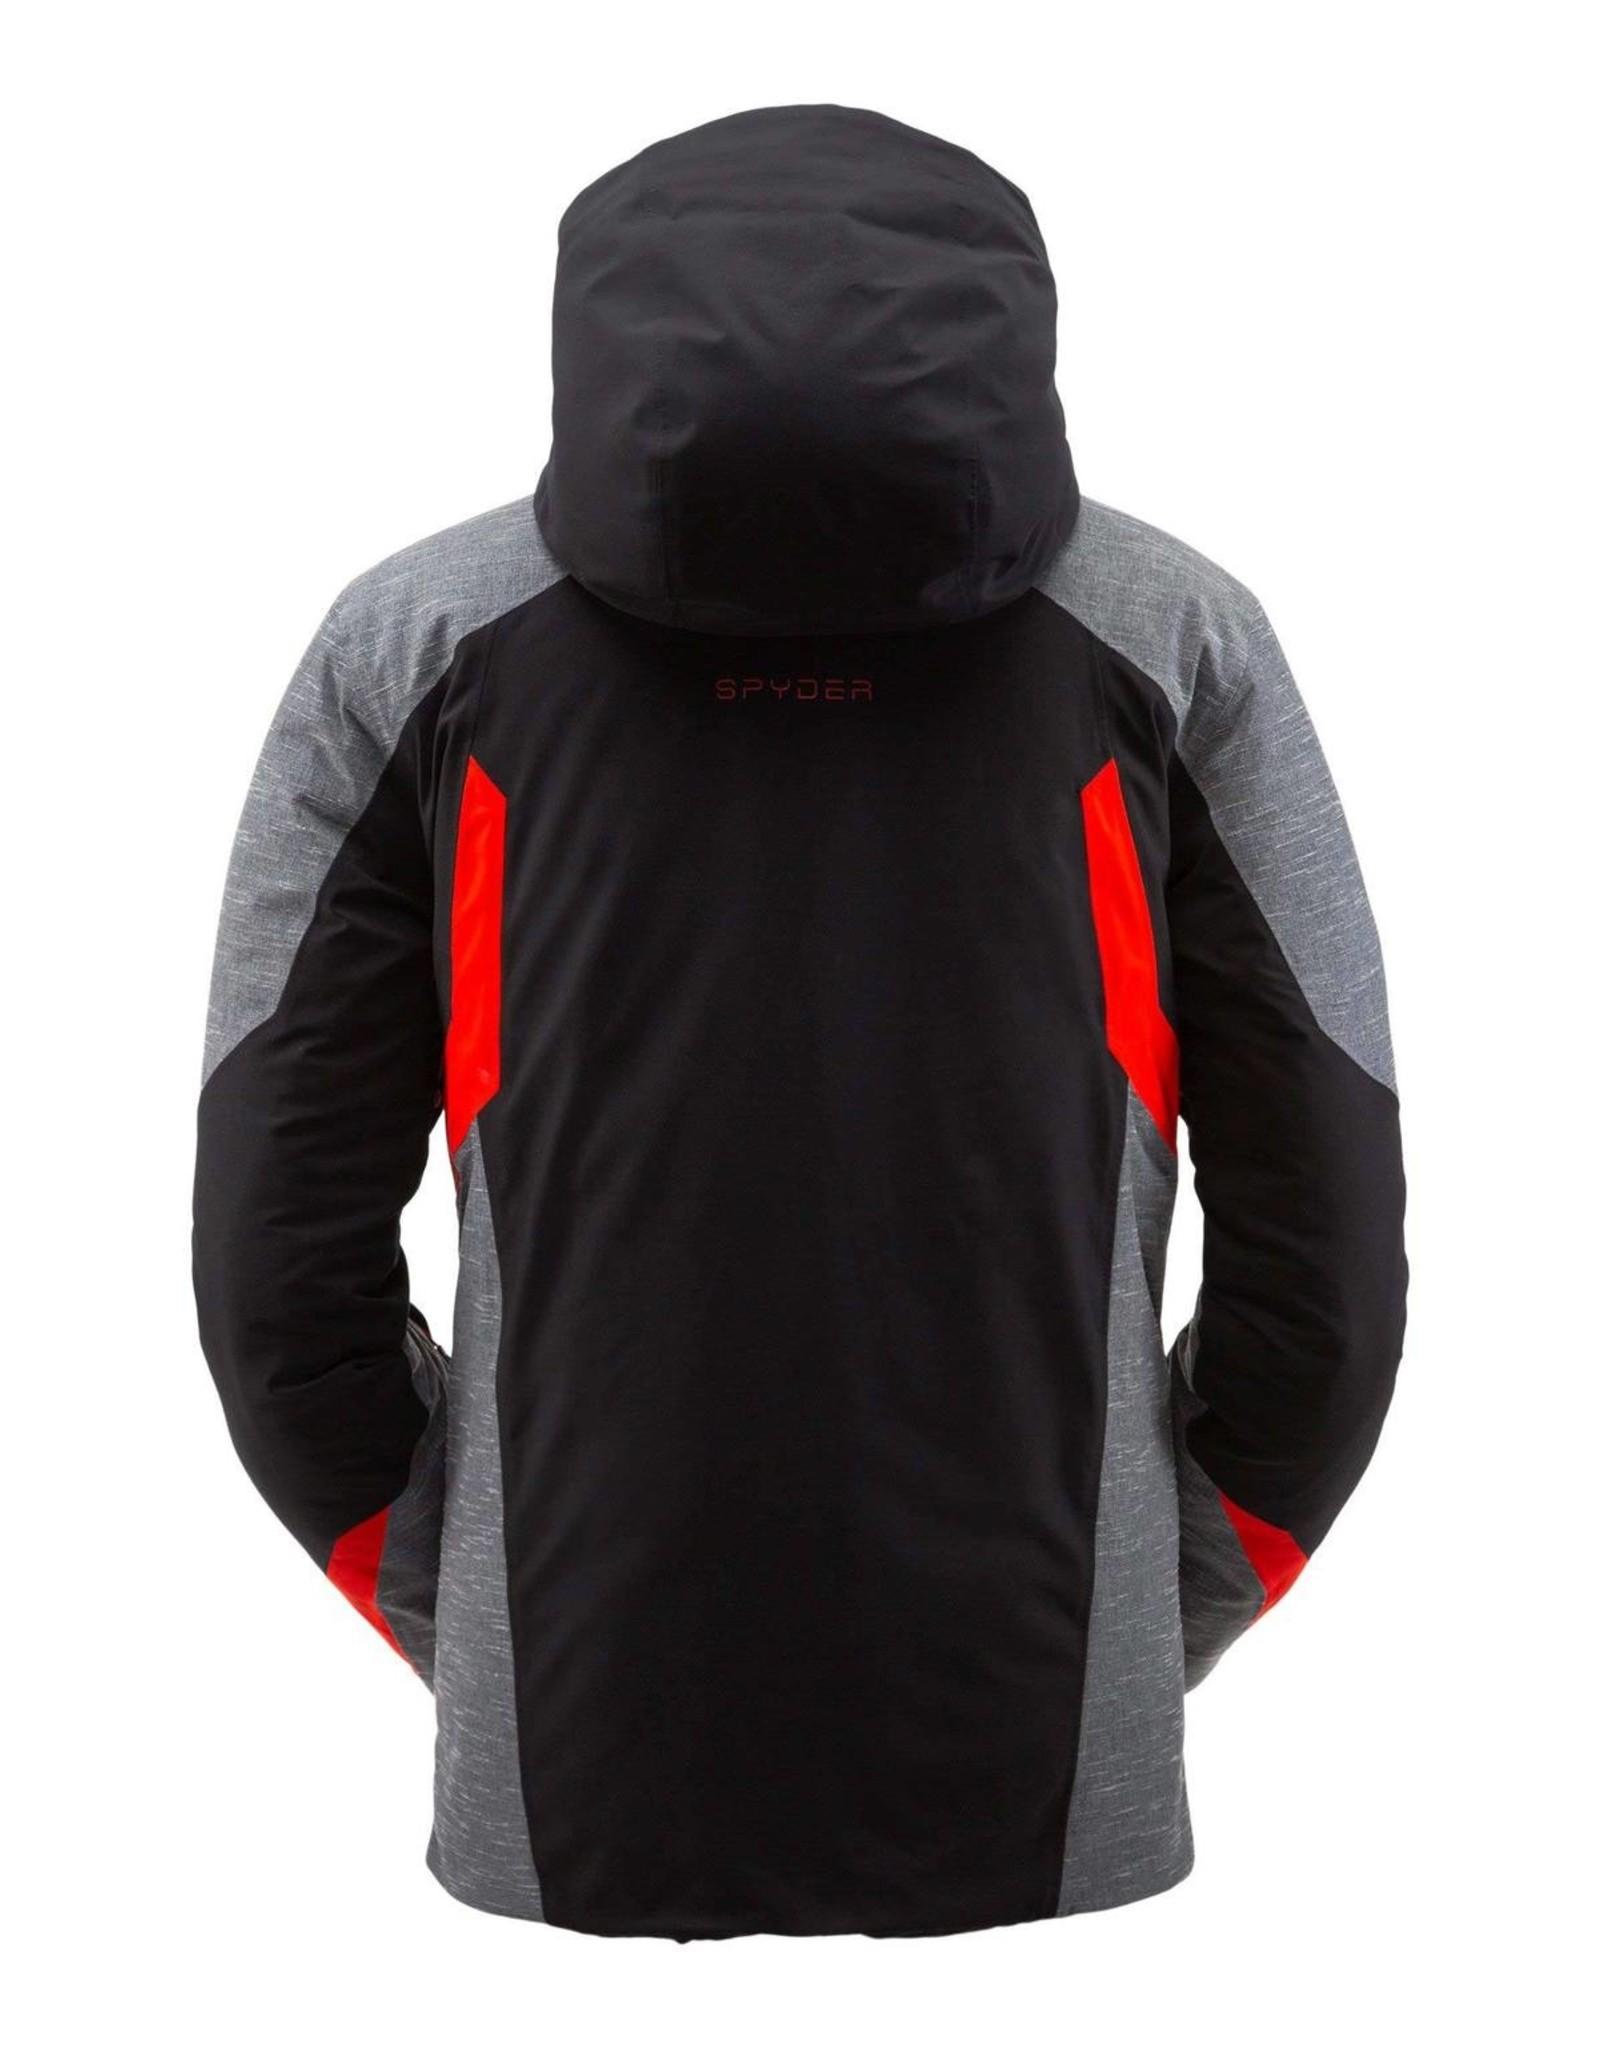 Spyder Spyder Men's Copper GTX Jacket Black Volcano XX-Large